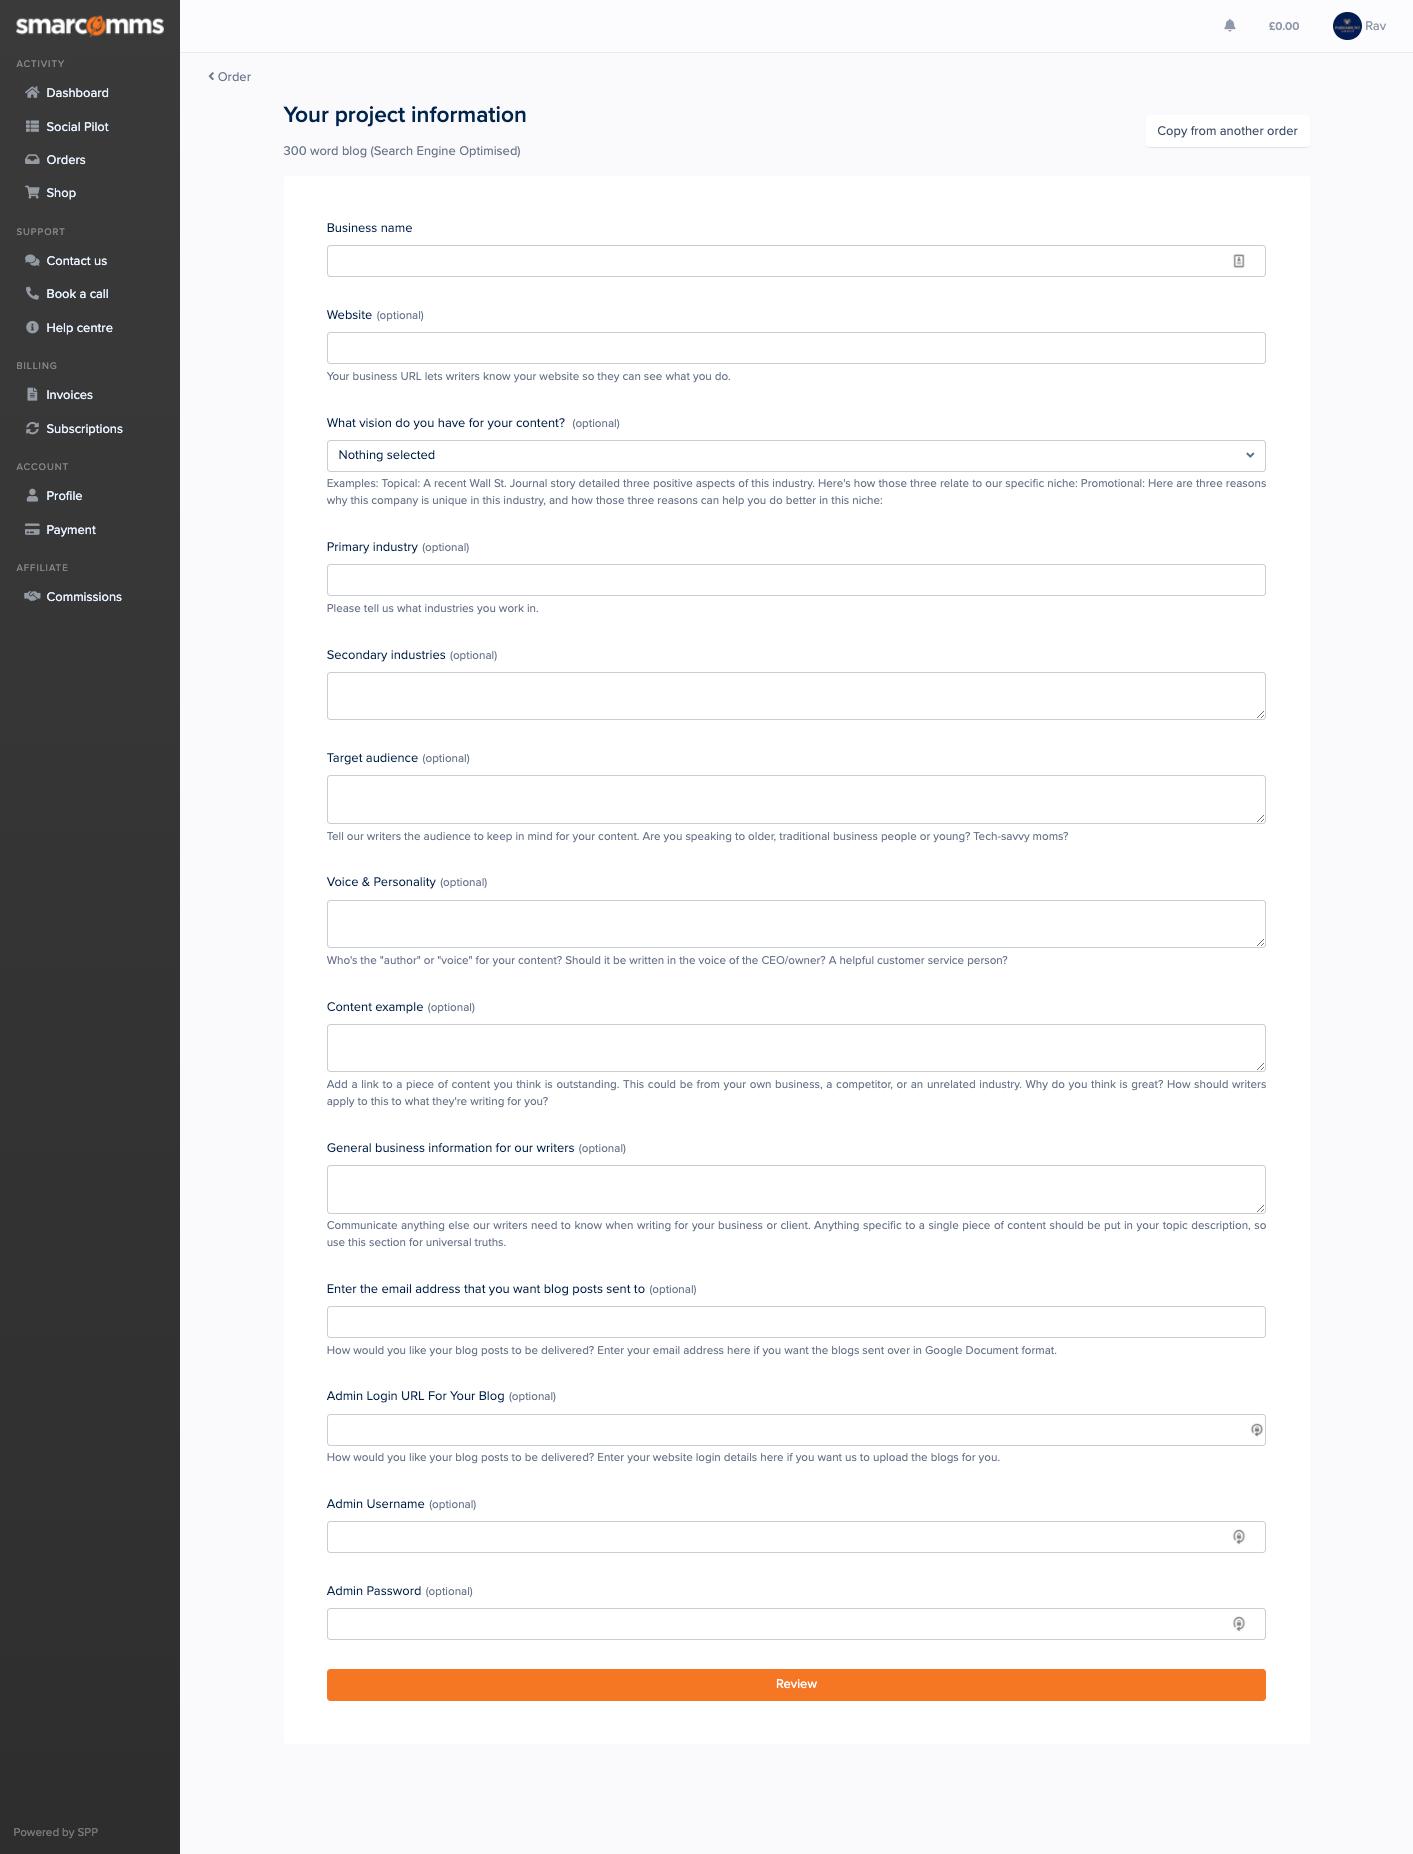 Smarcomms SEO blog intake form